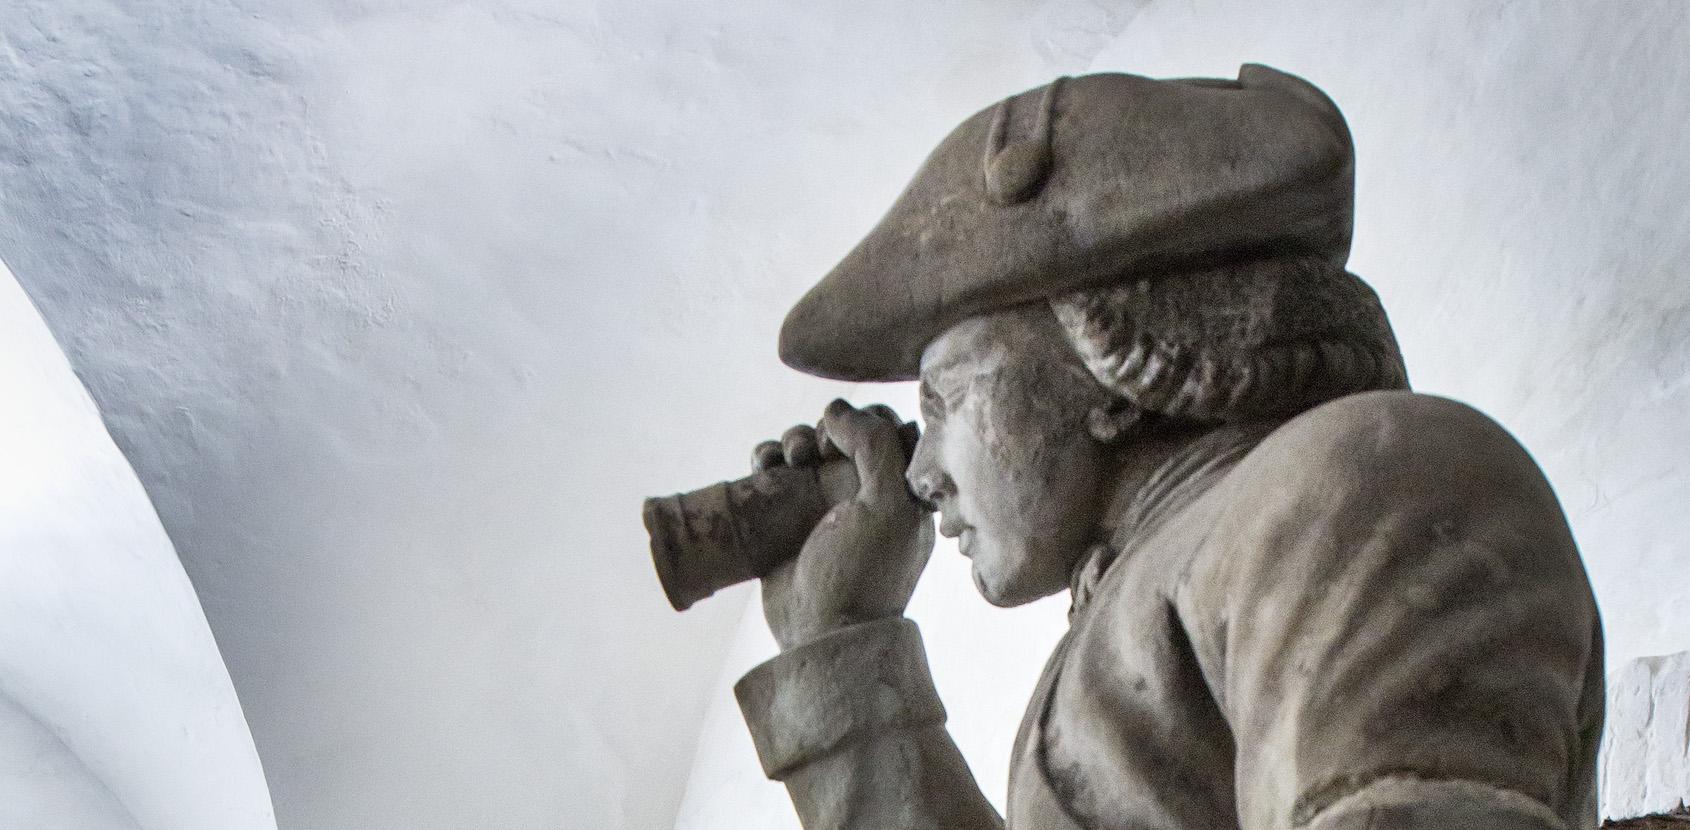 Mand med kikkert. Kongernes Lapidarium. Foto: Thorkild Jensen